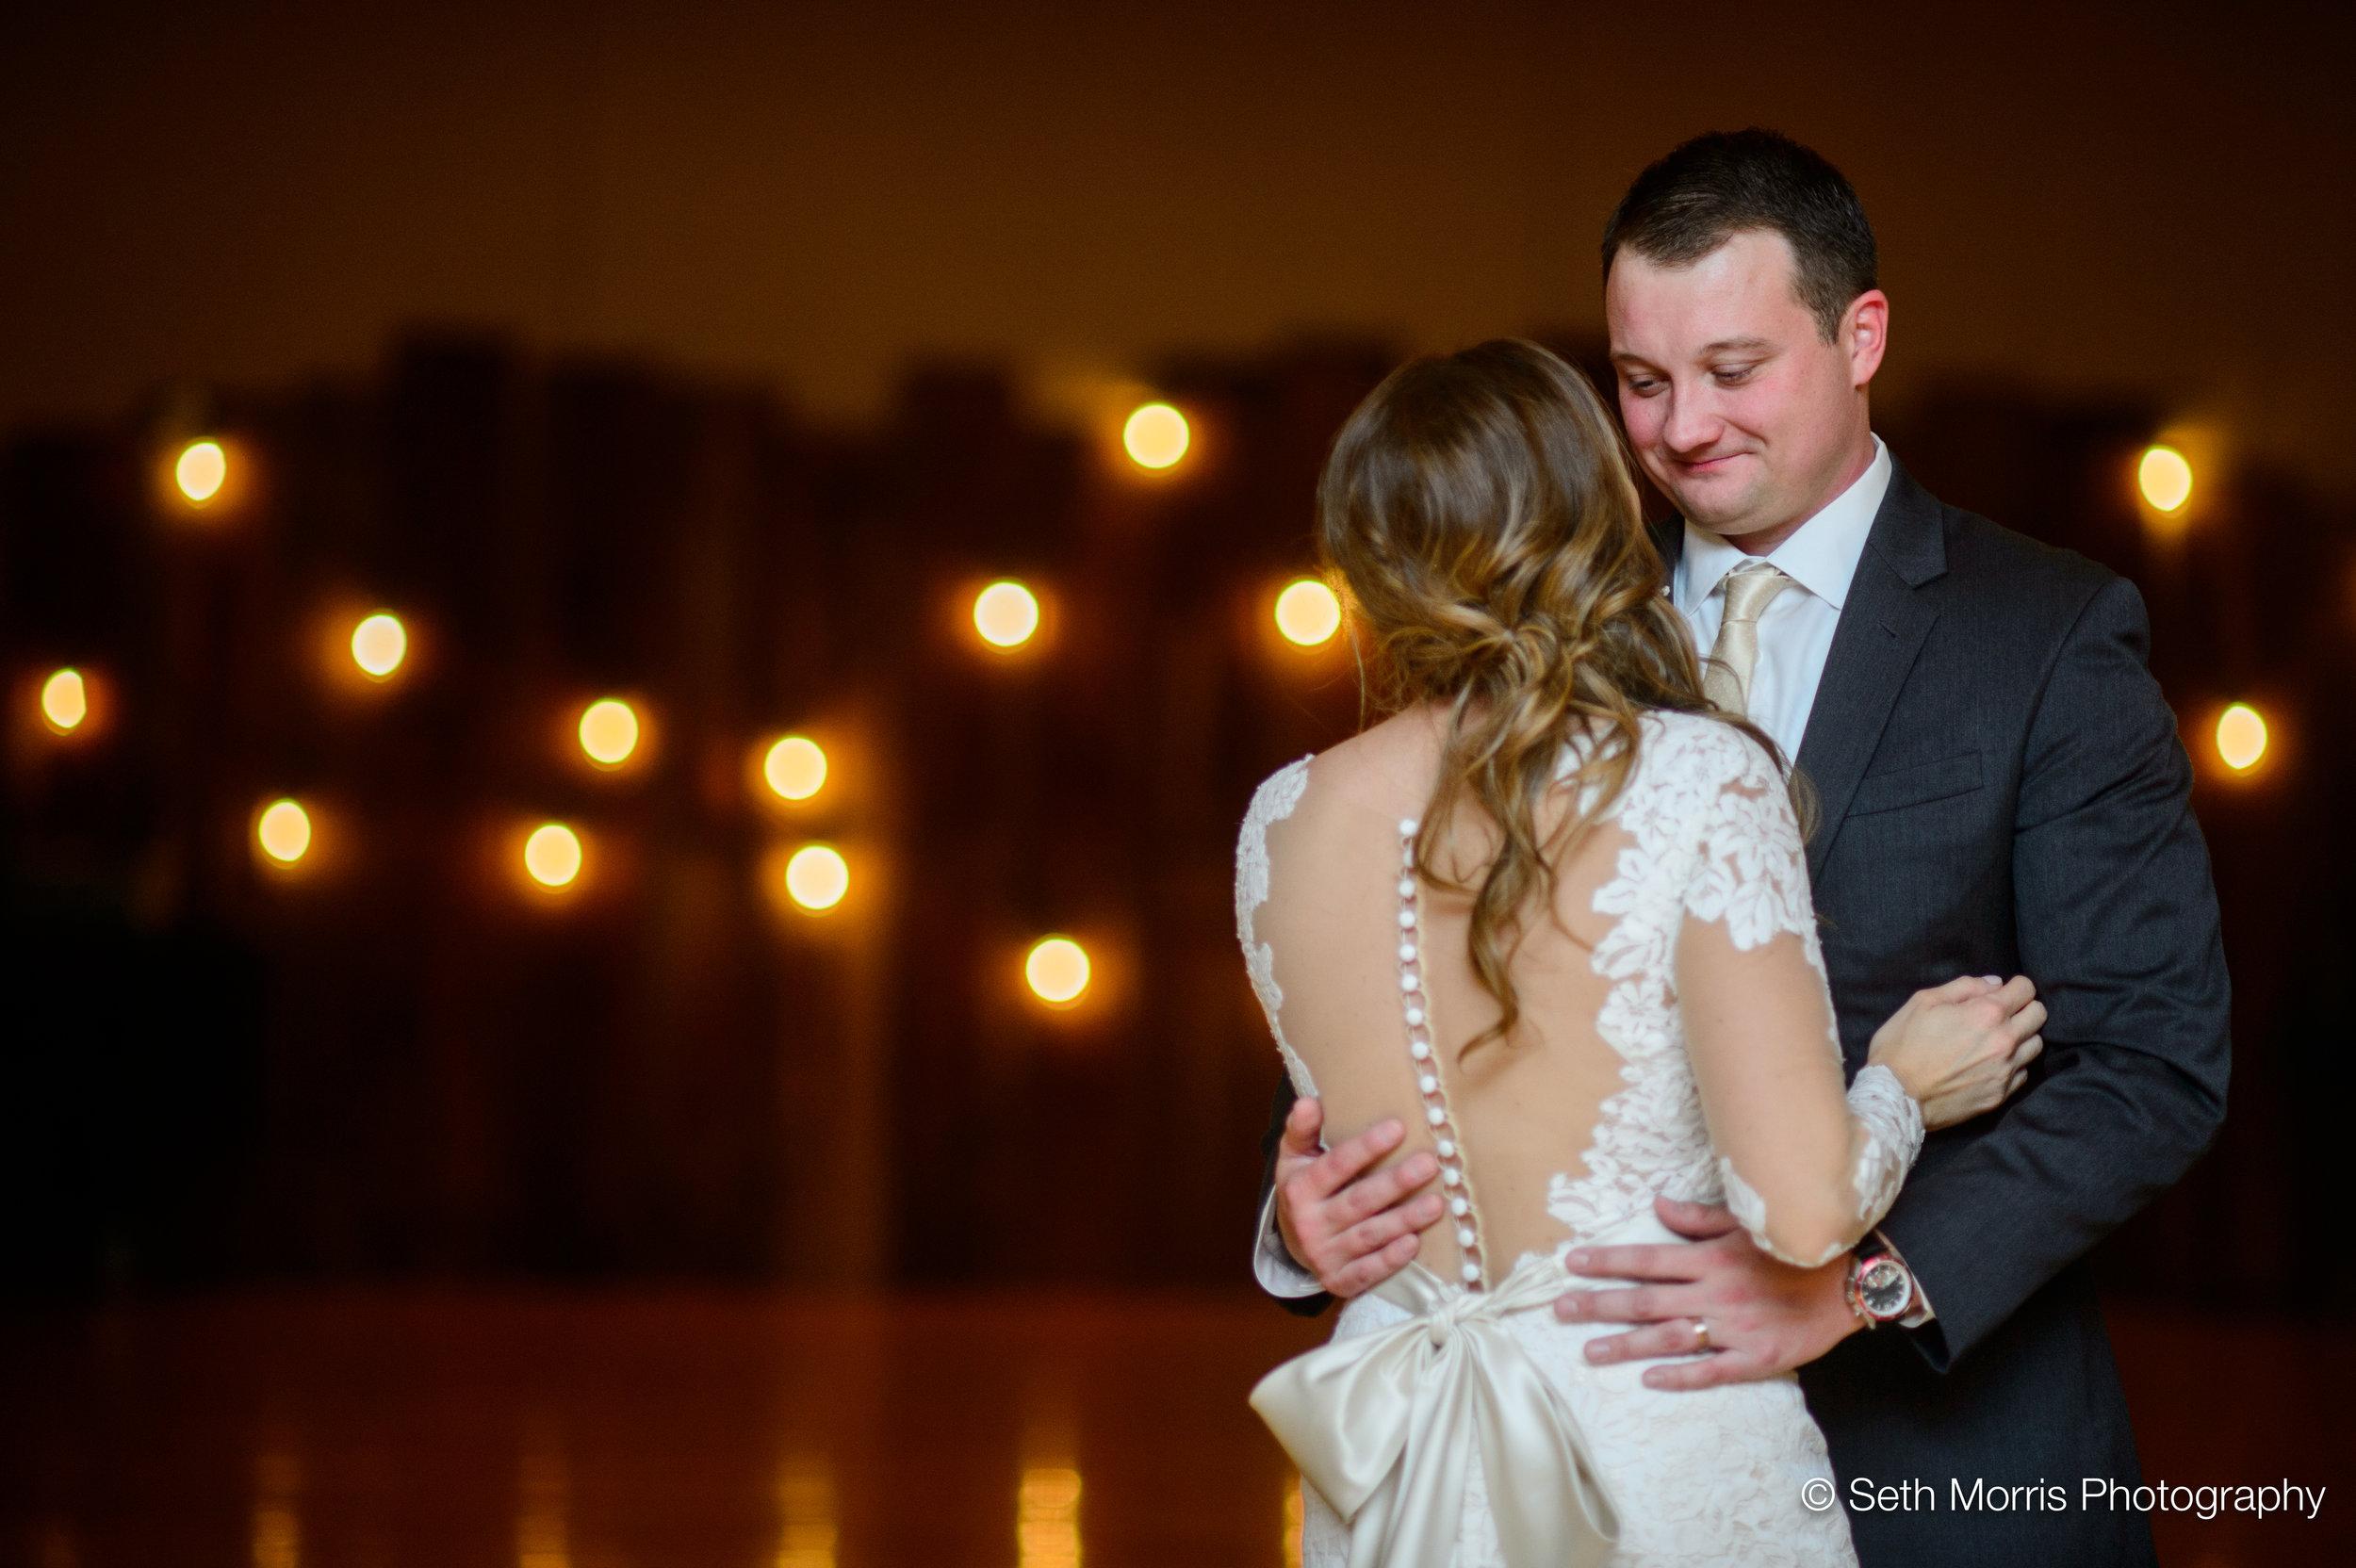 morris-wedding-photographer-21.jpg